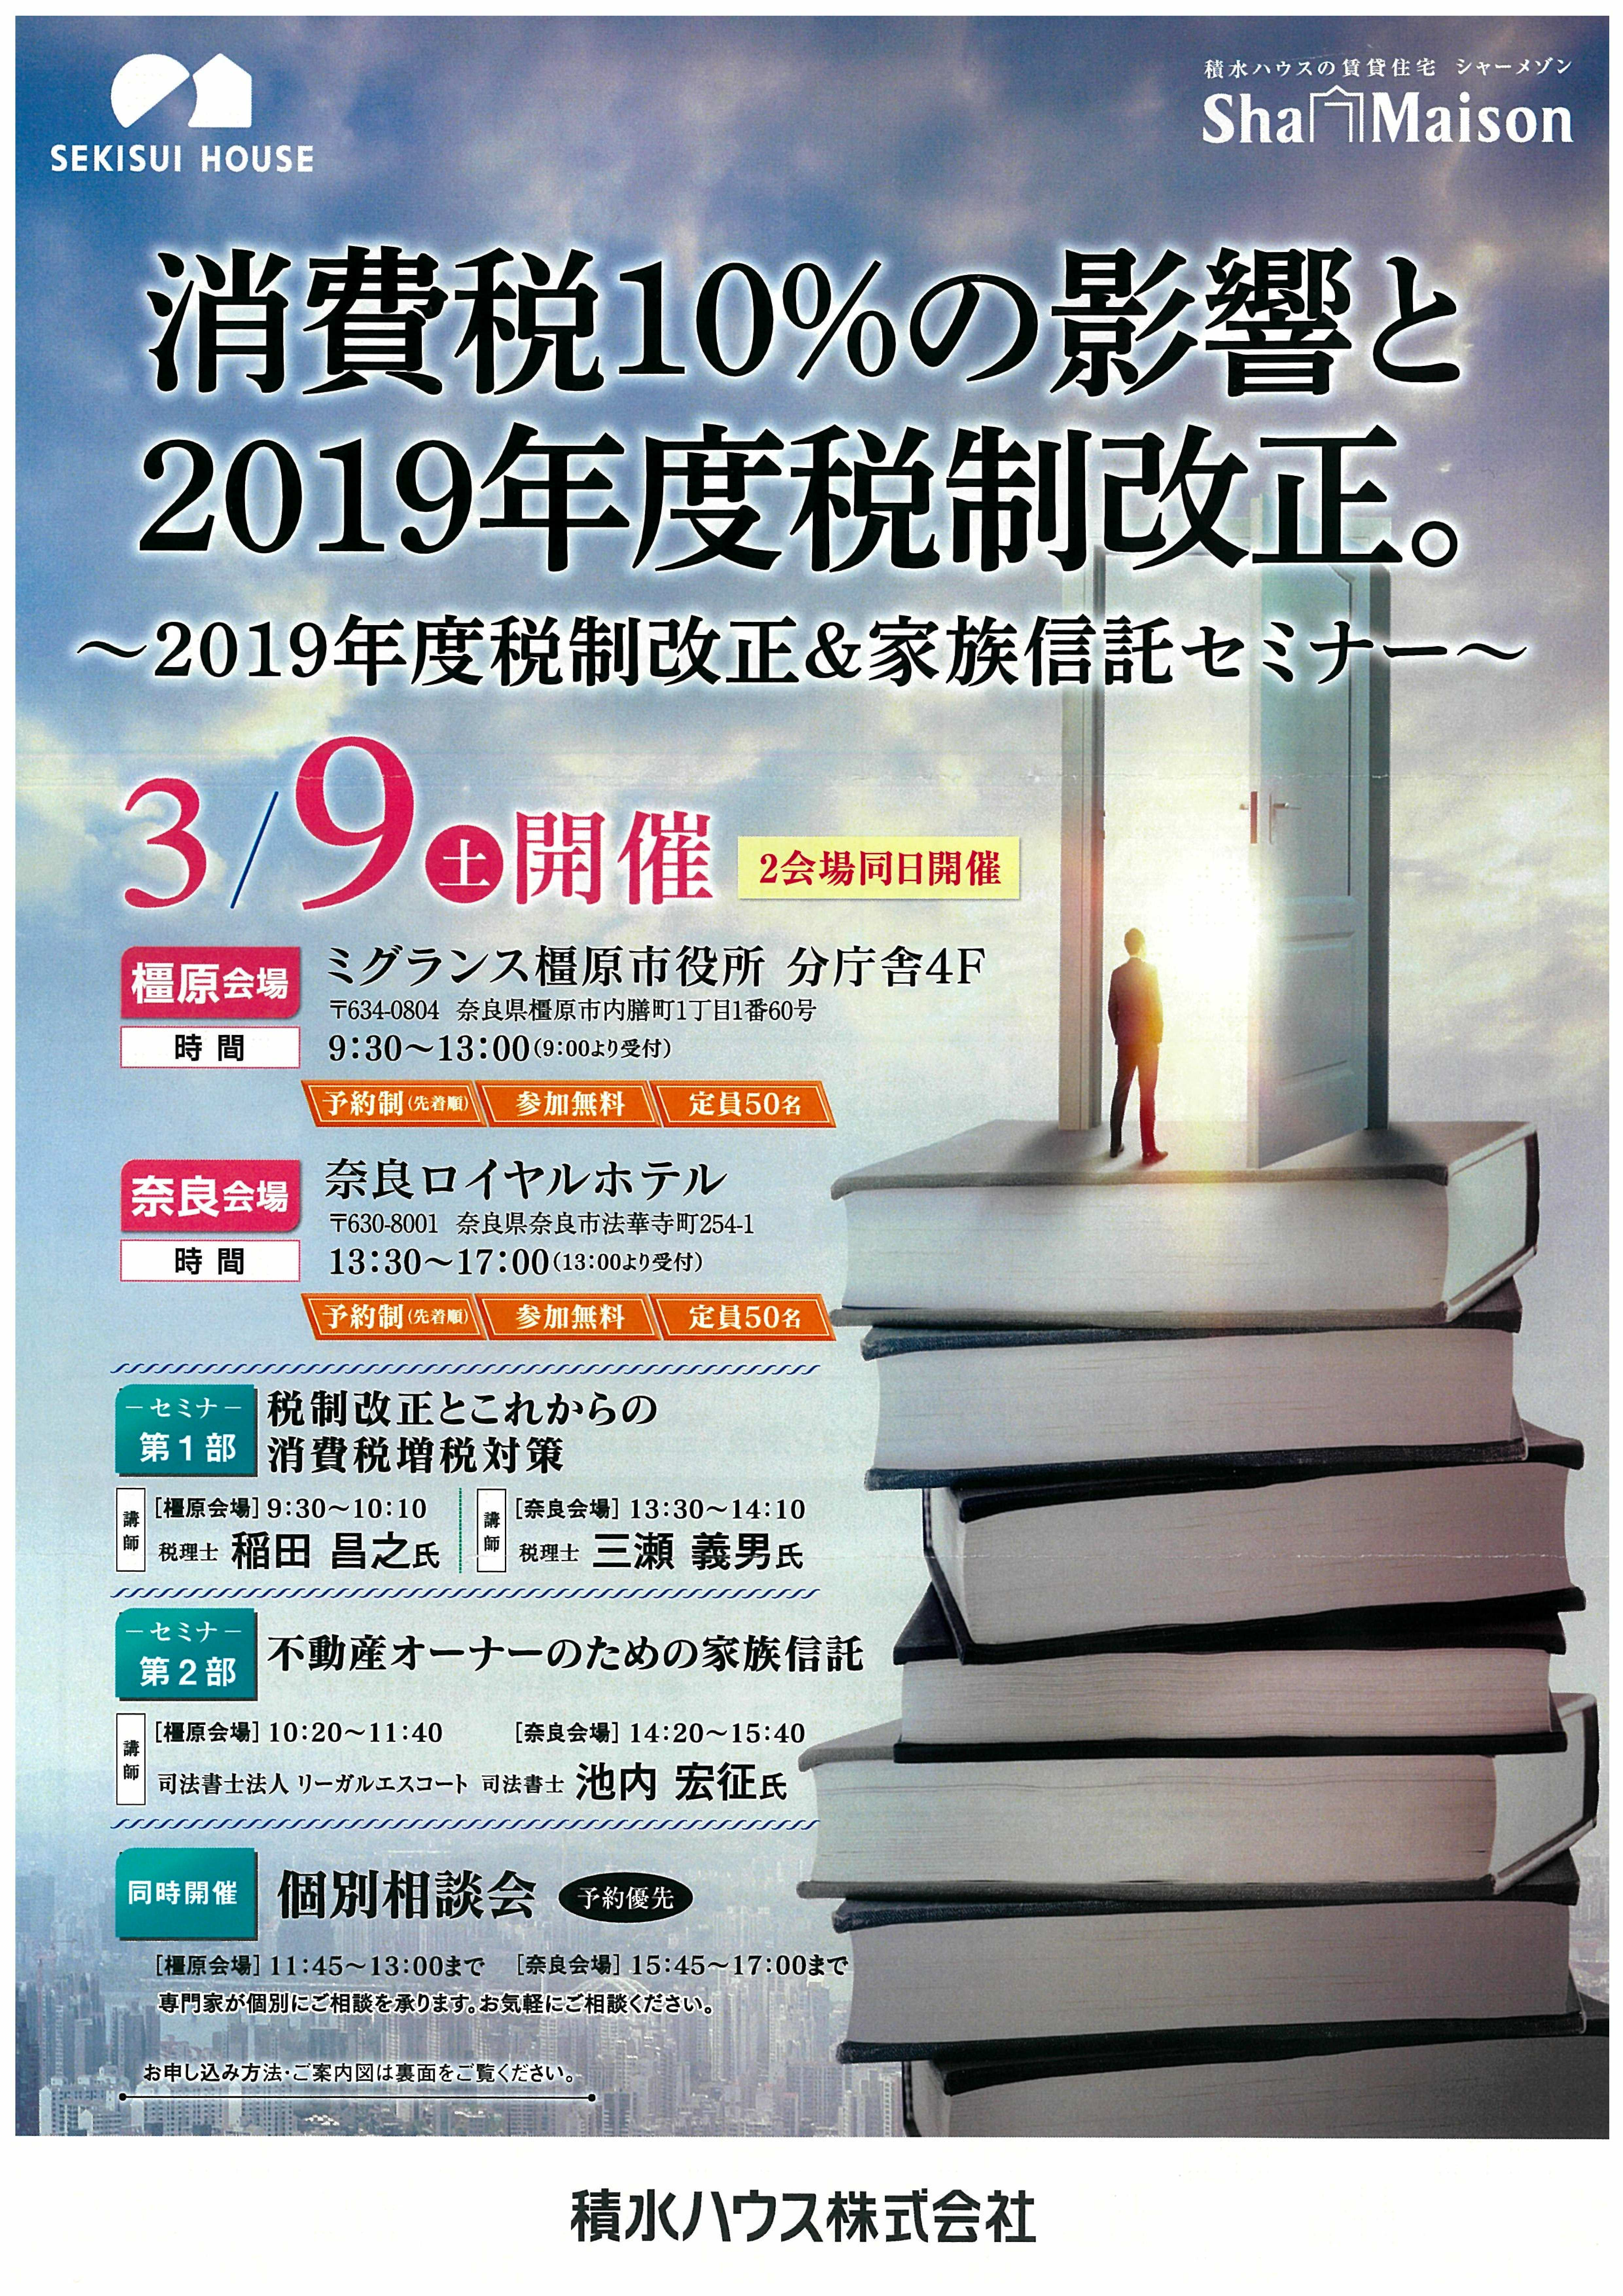 2019年度税制改正&家族信託セミナー